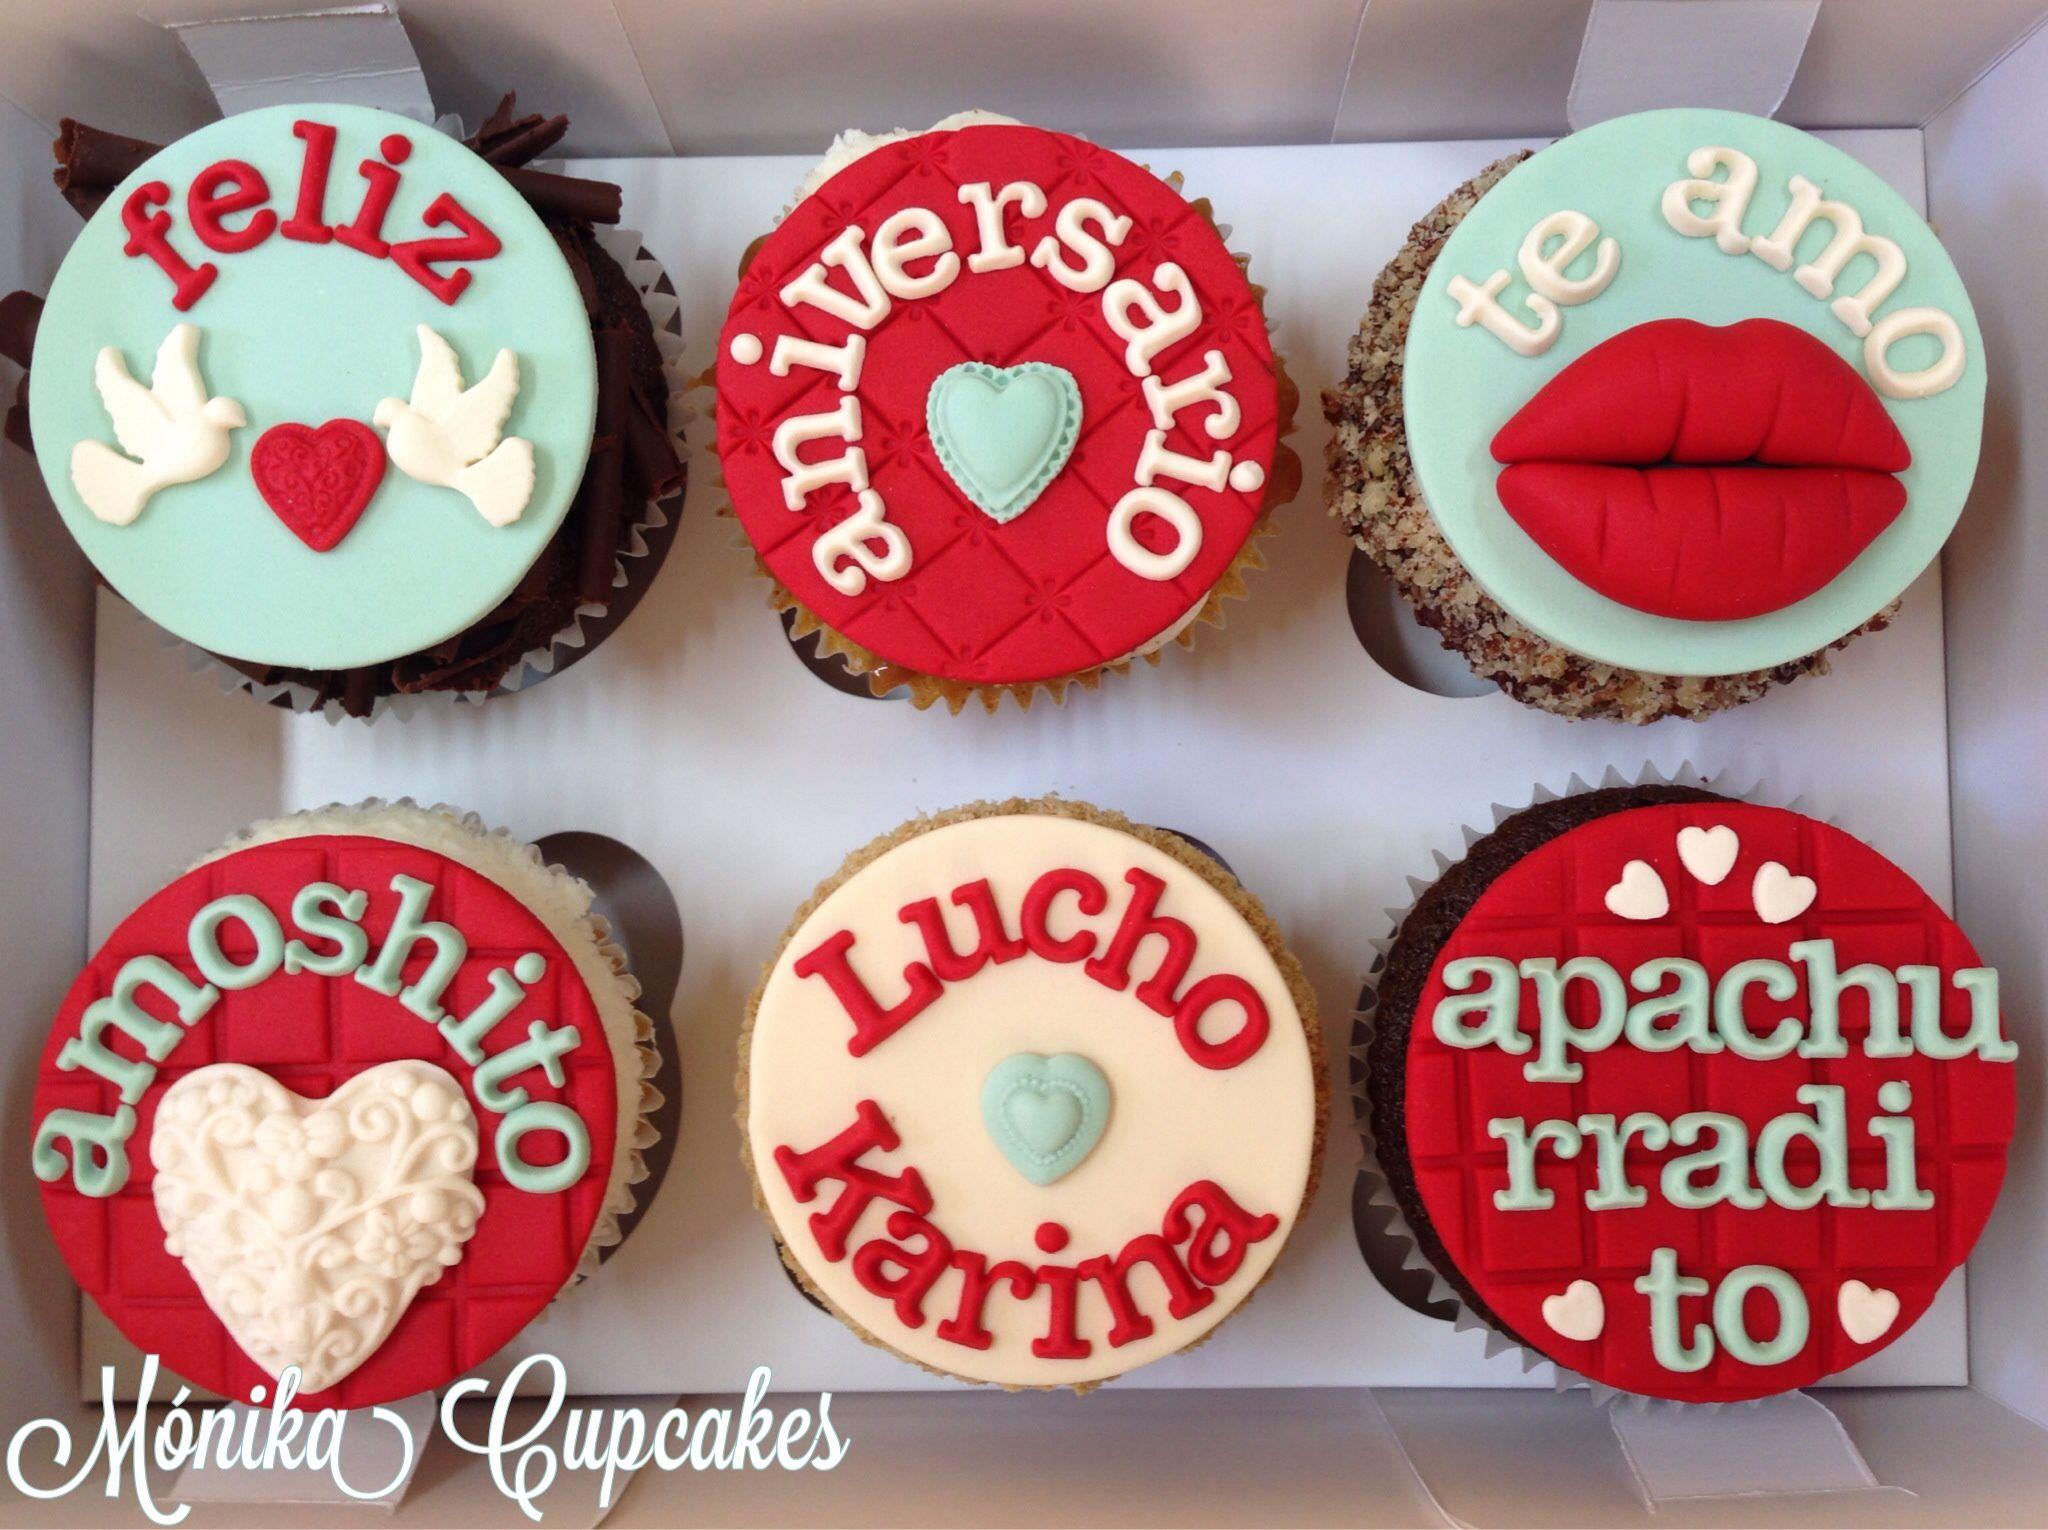 Pasteles Aniversarios Pictures To Pin On Pinterest: Cupcakes De Aniversario